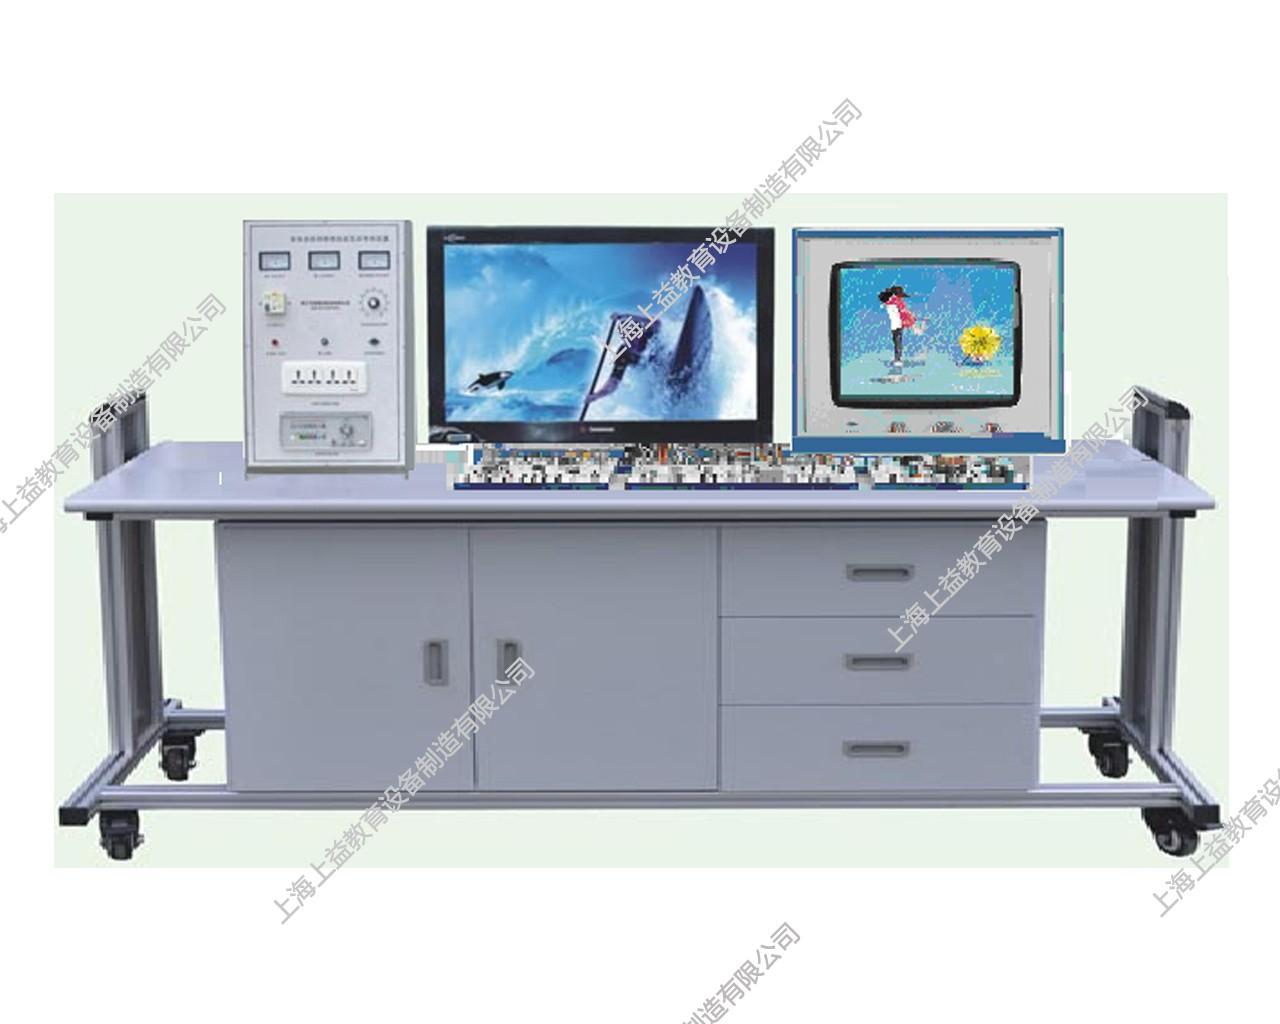 SYBR-606型 家用电器产品高级工 技师技能wwwlehu8viplehu68vip装置